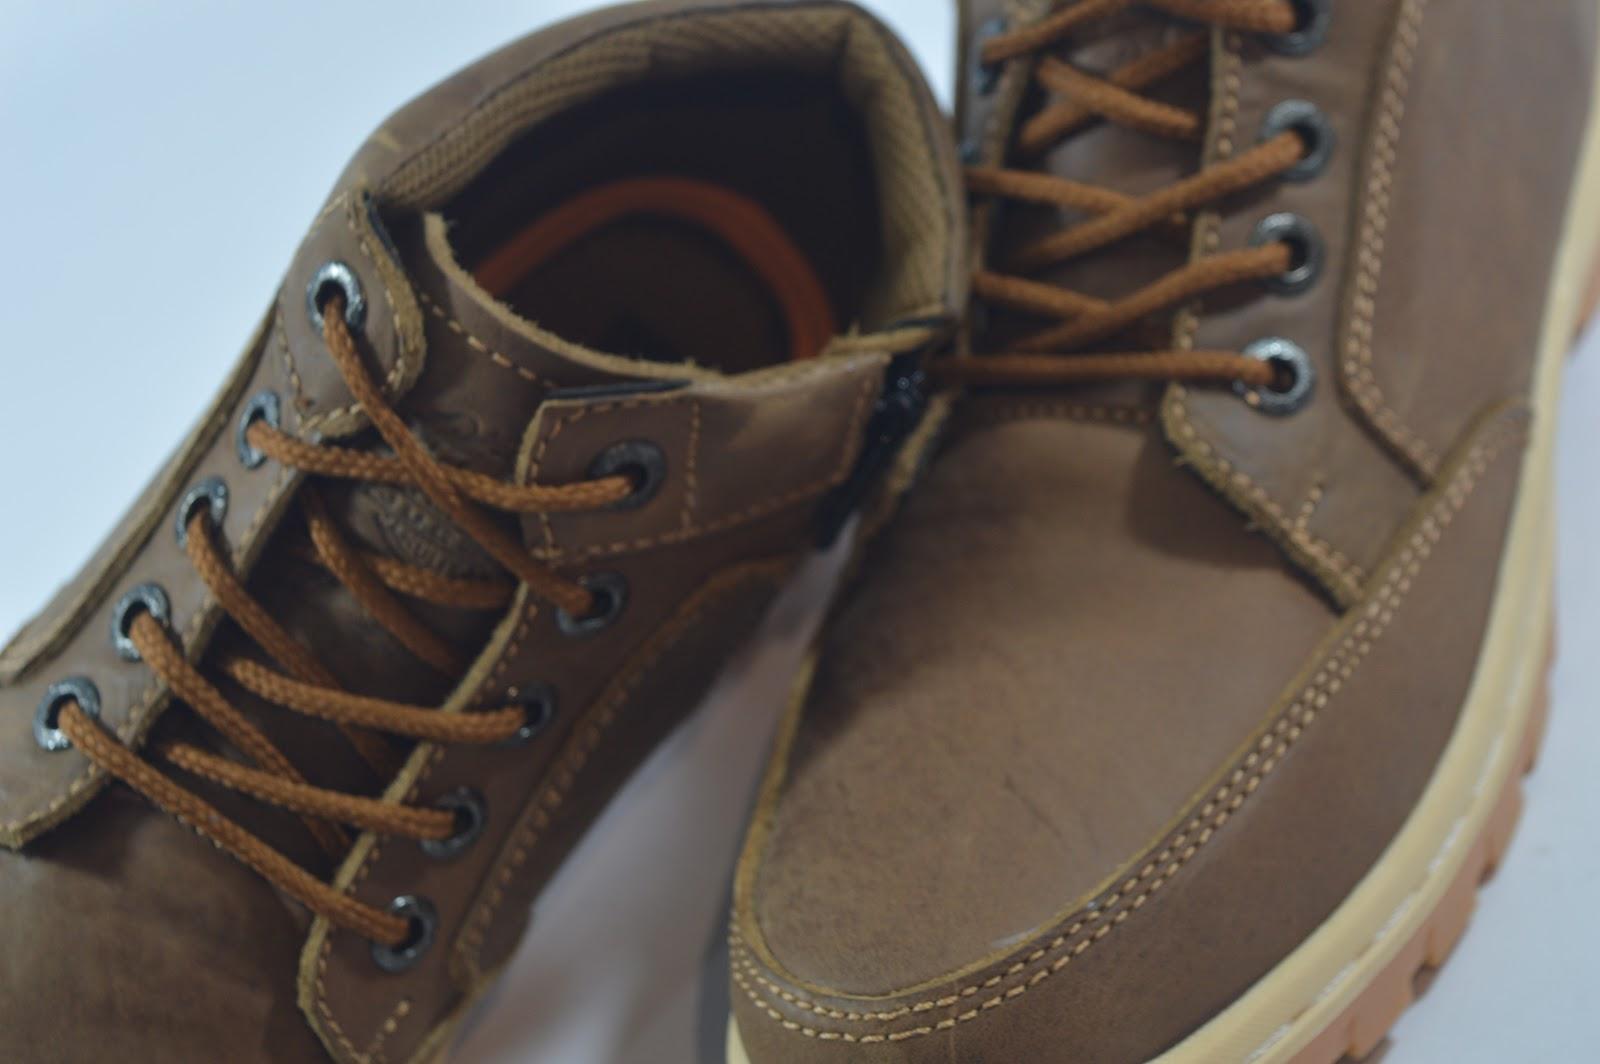 Agen sepatu kulit Bandung  0812-3388-5874 Agen sepatu kulit Jakarta ... 42cf222e1e